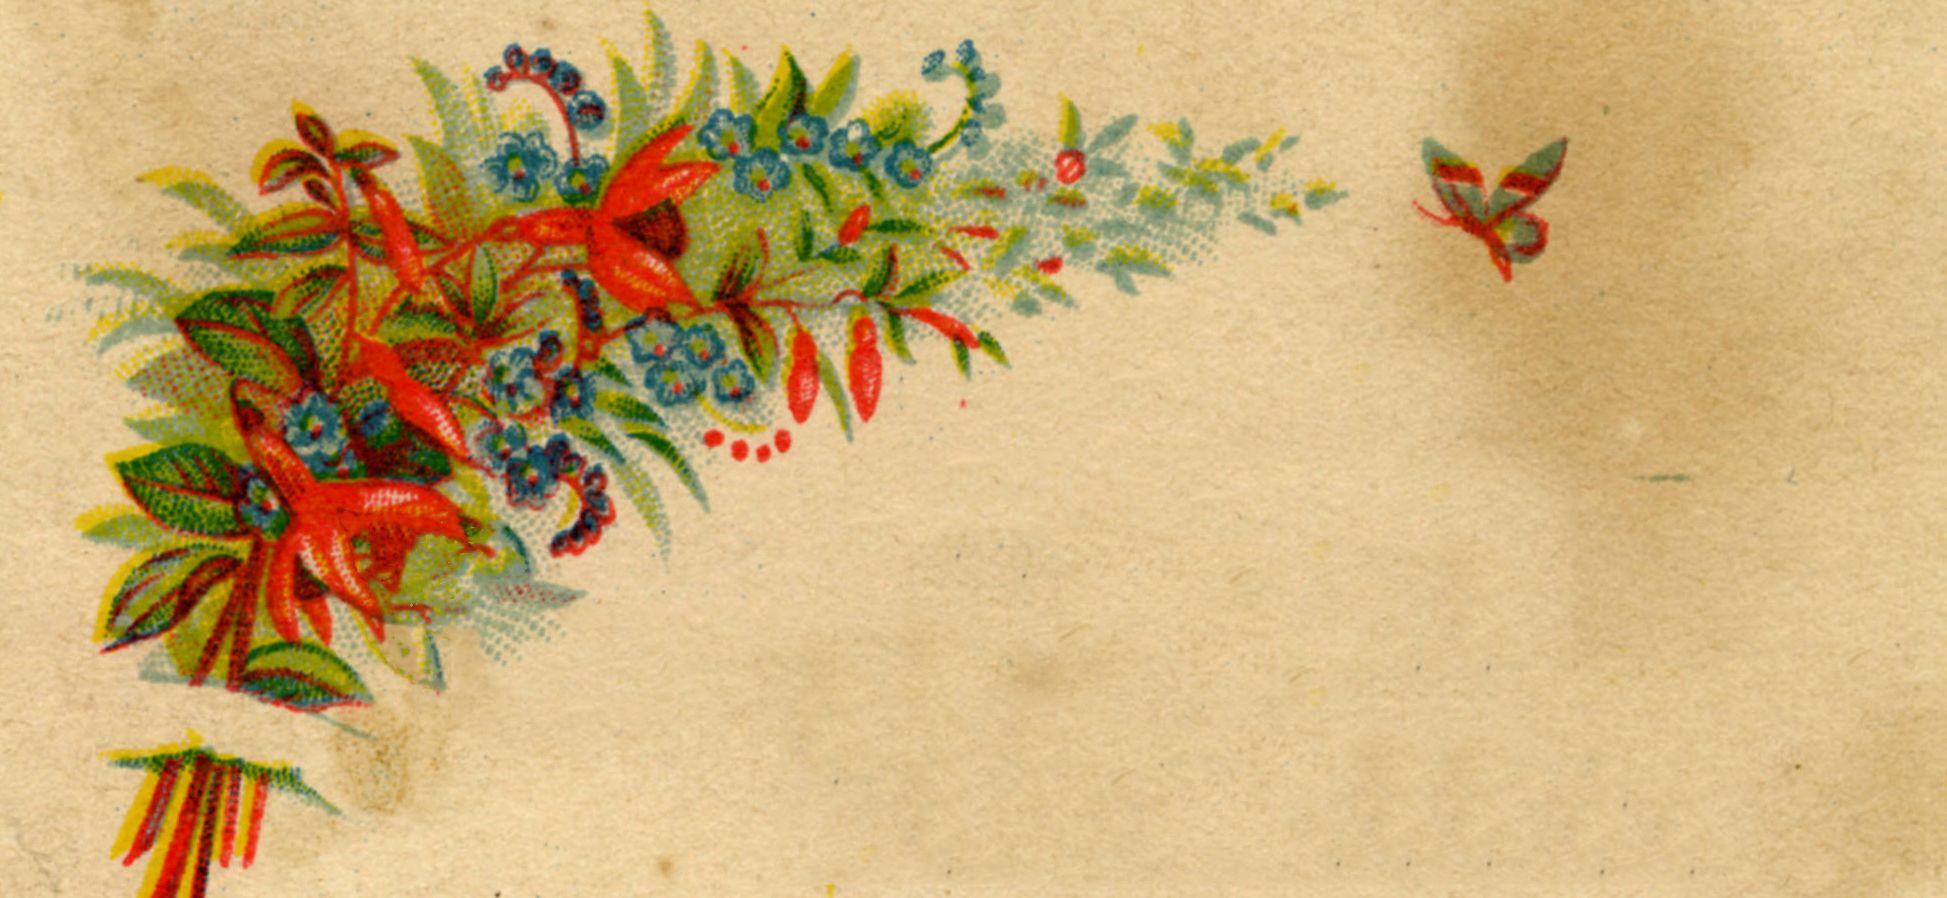 Victorian Trade Card | -Print This- | Pinterest | Victorian, Scrap ...